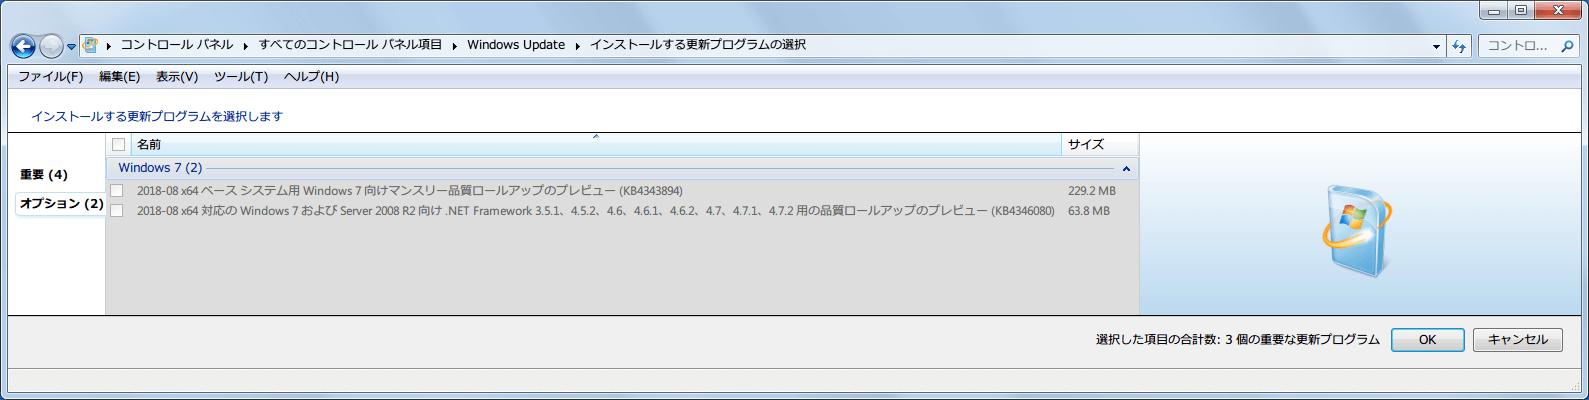 Windows 7 64bit Windows Update オプション 2018年8月分リスト KB4343894 KB4346080 非表示